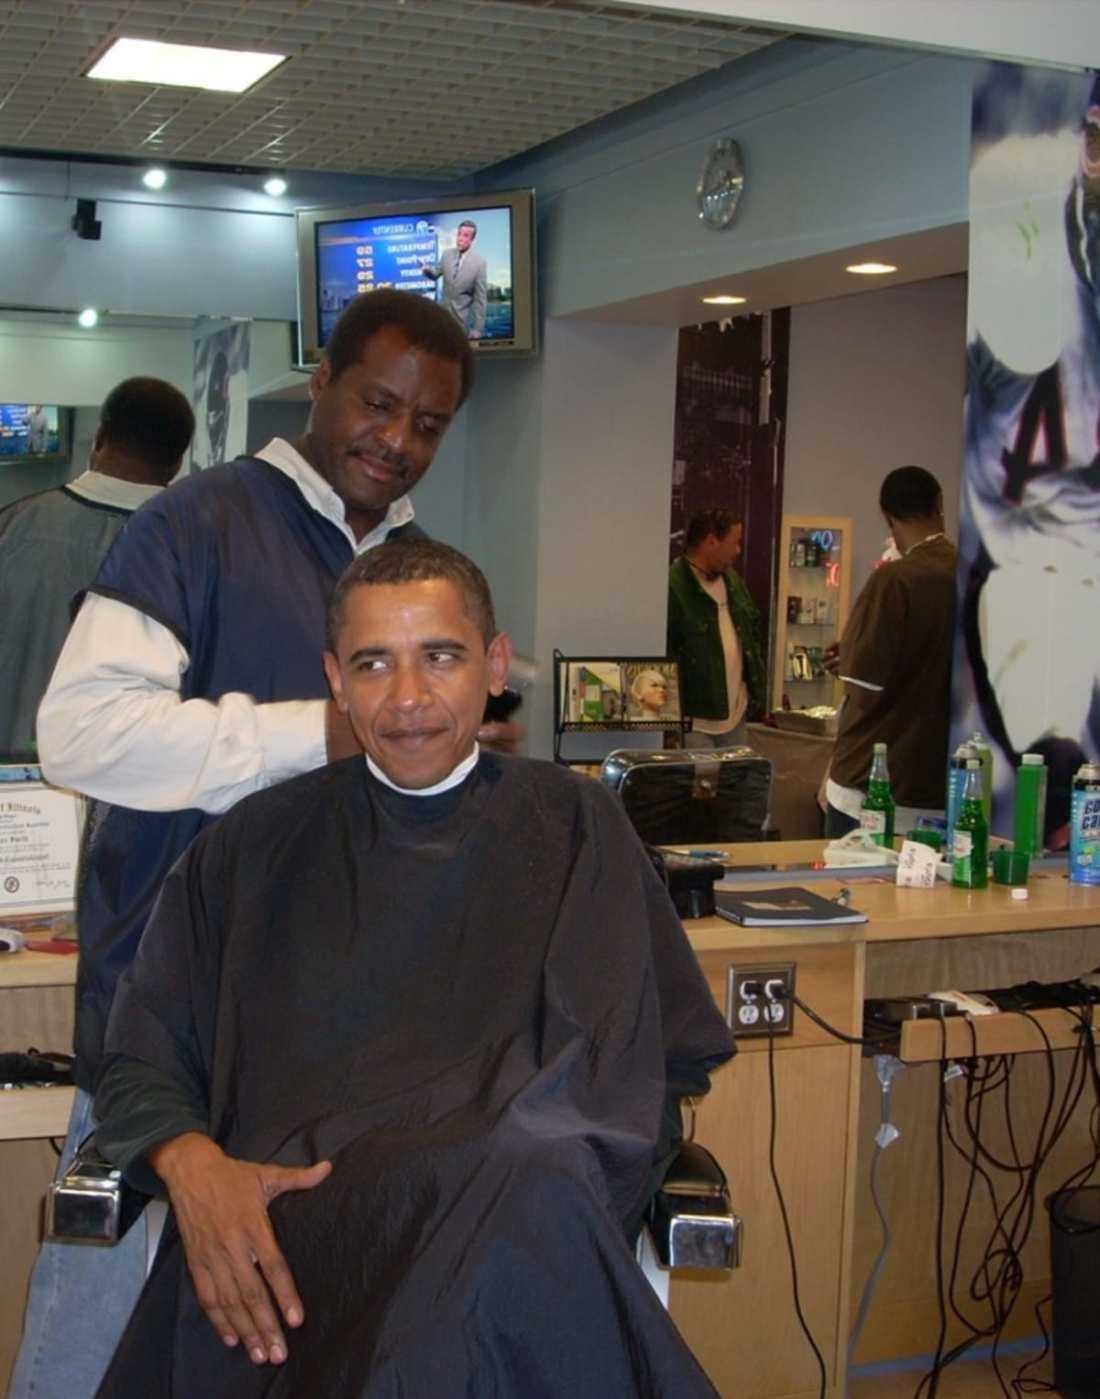 president-obama-and-barber.jpg